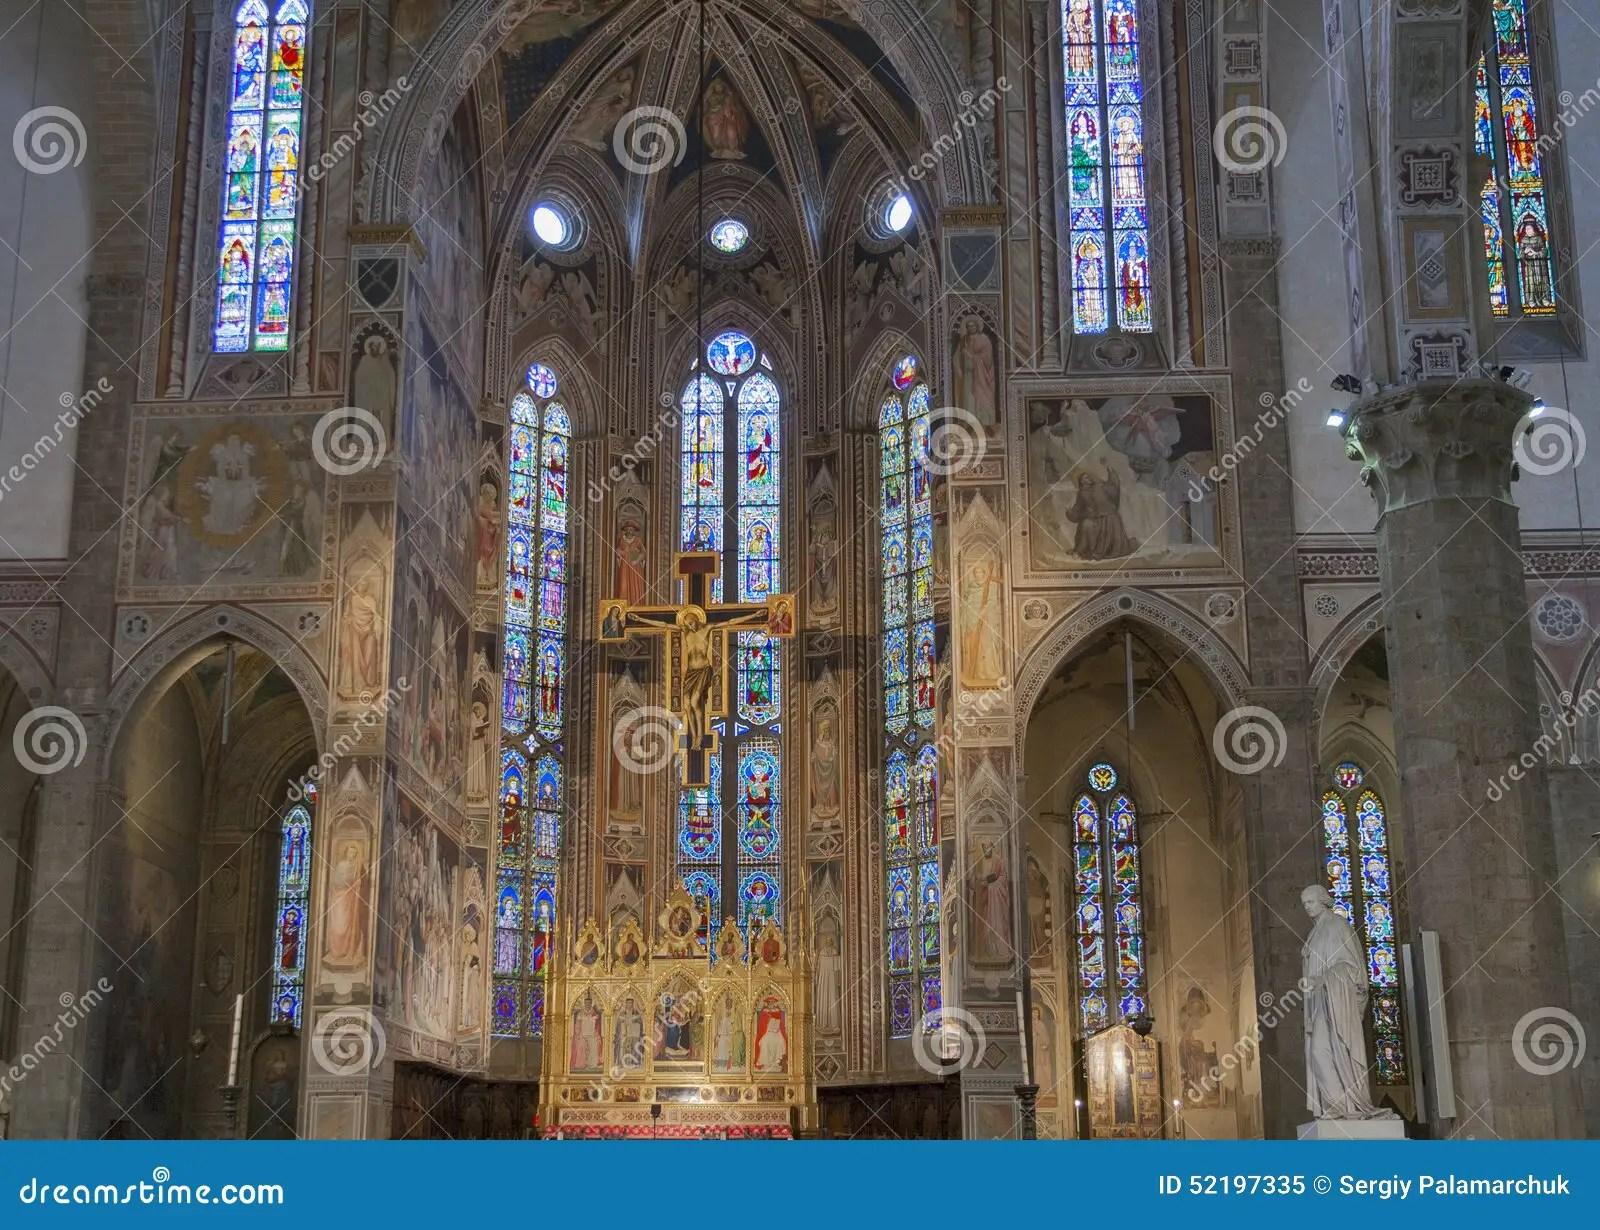 Interior Of Basilica Santa Croce In Florence Italy Stock Photo  Image 52197335